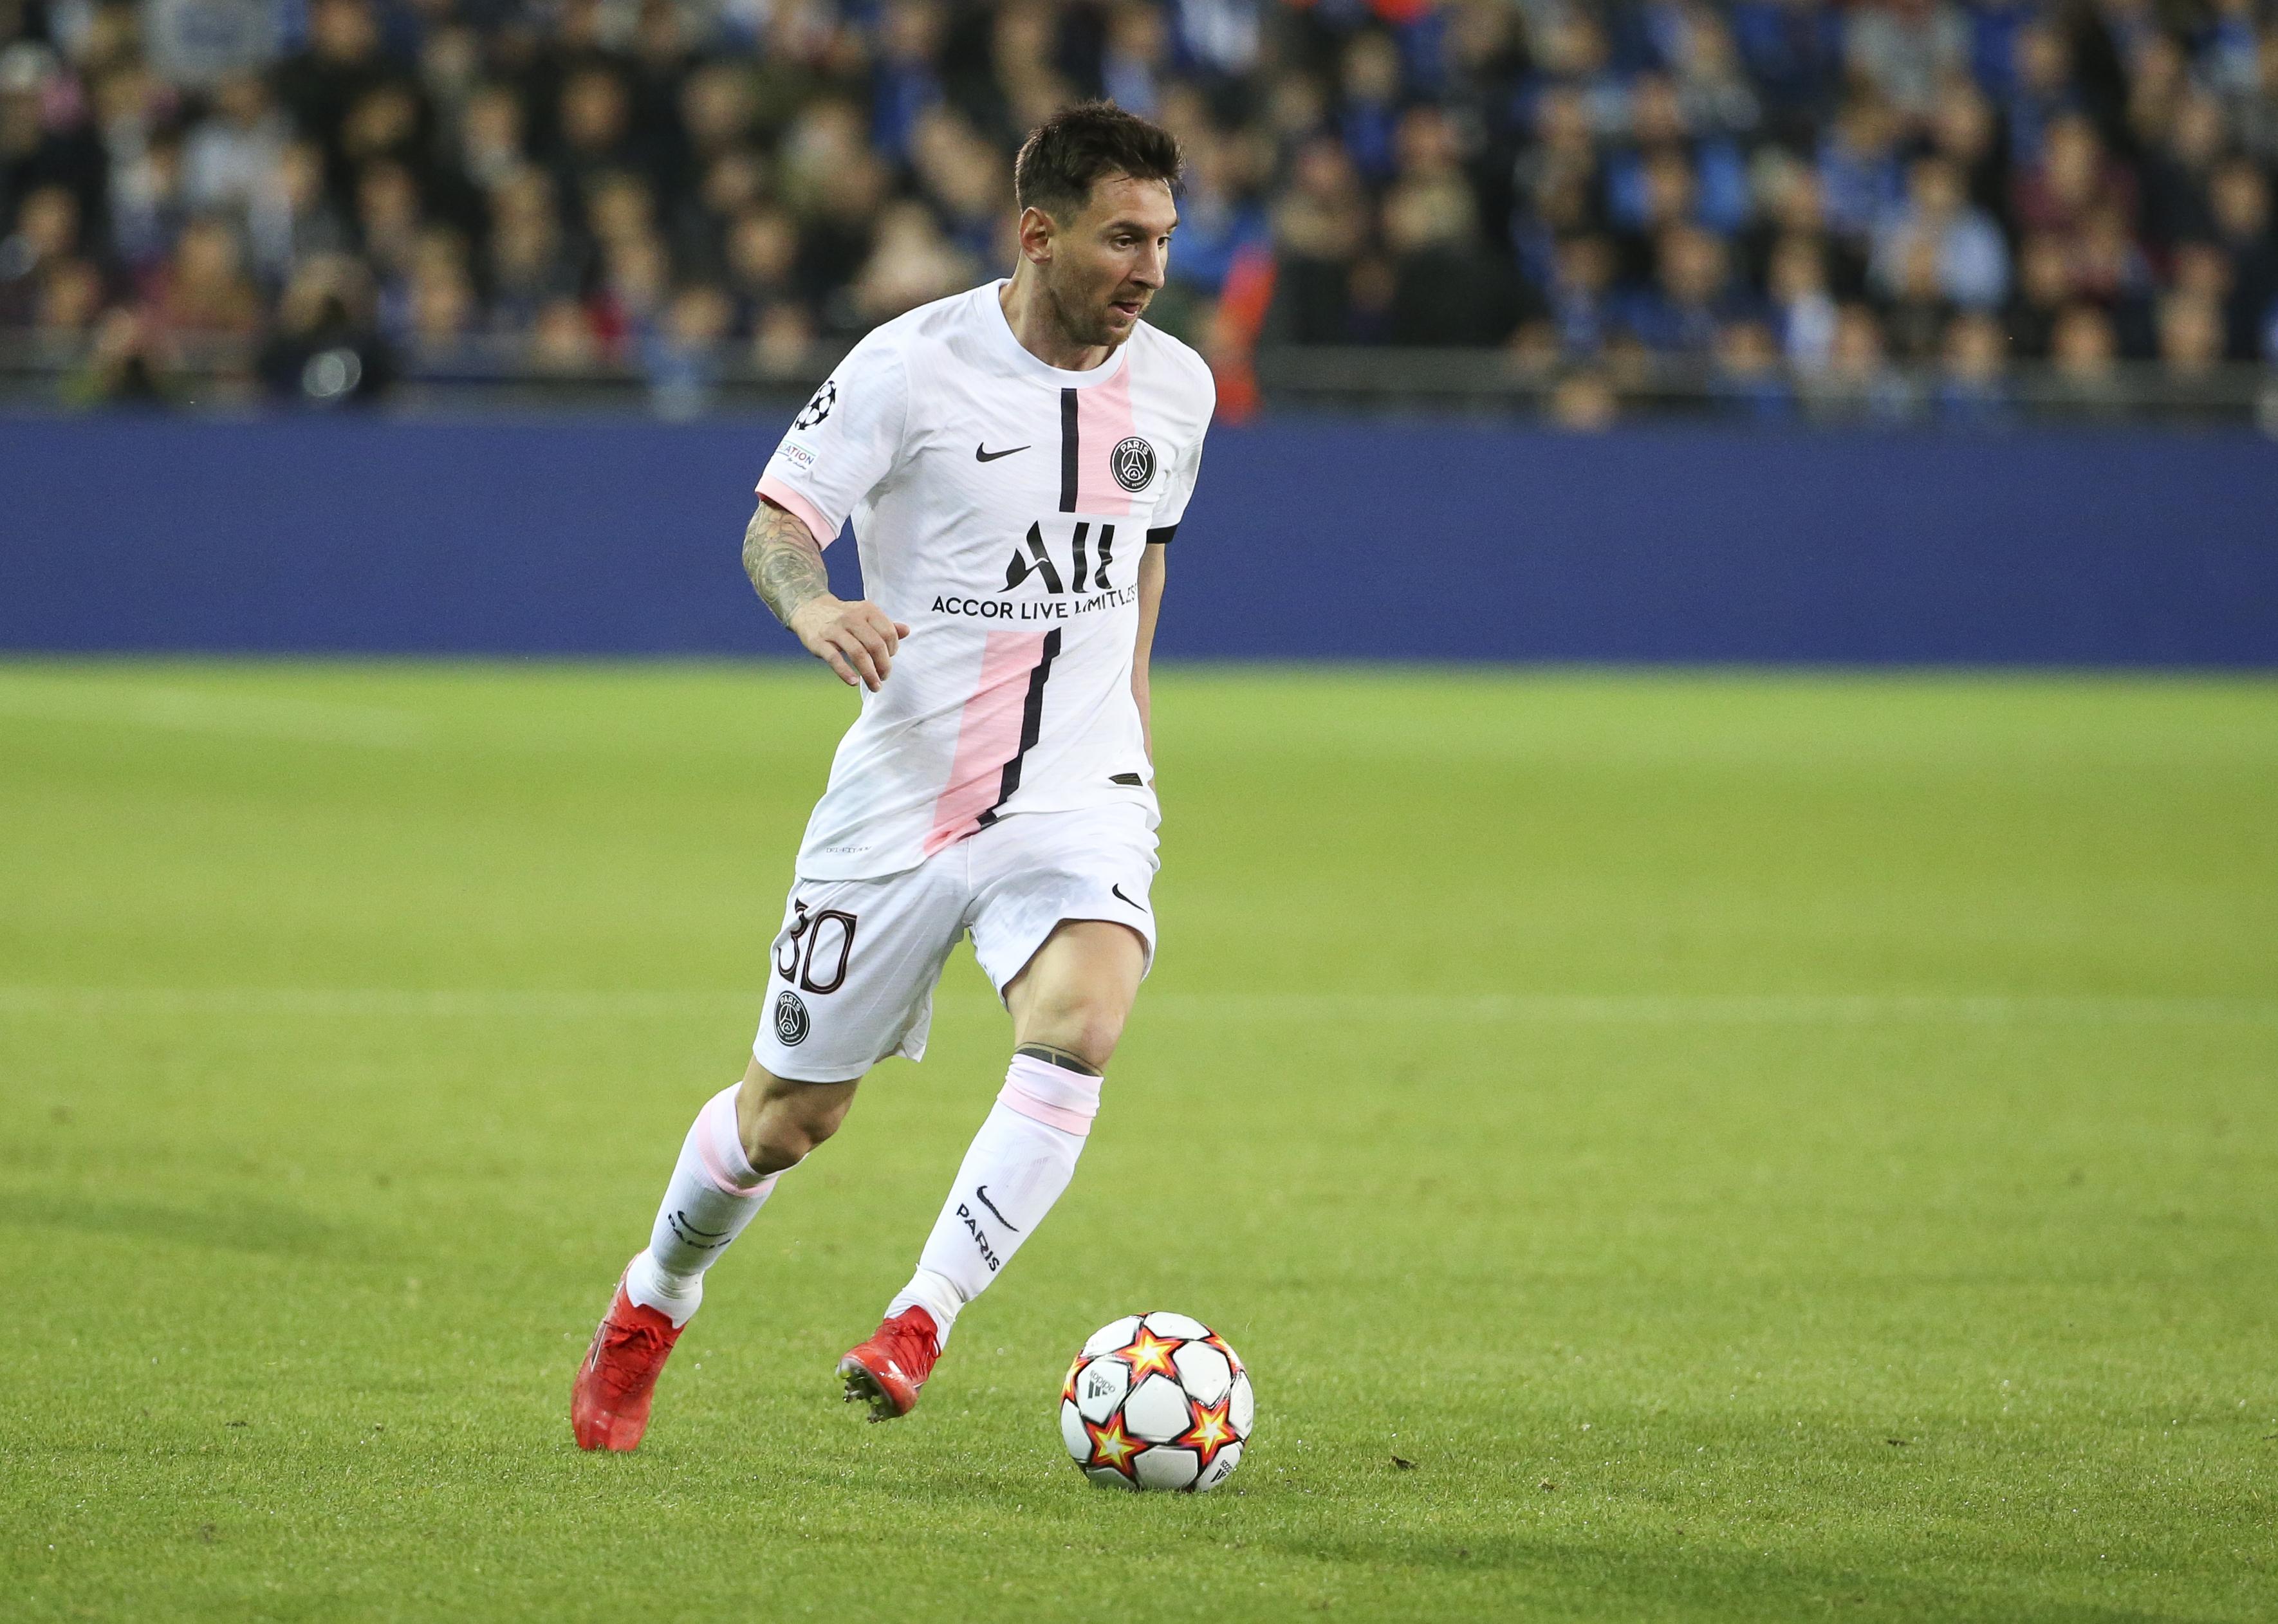 Según L'Équipe, Messi cobrará 110 millones de euros en el PSG